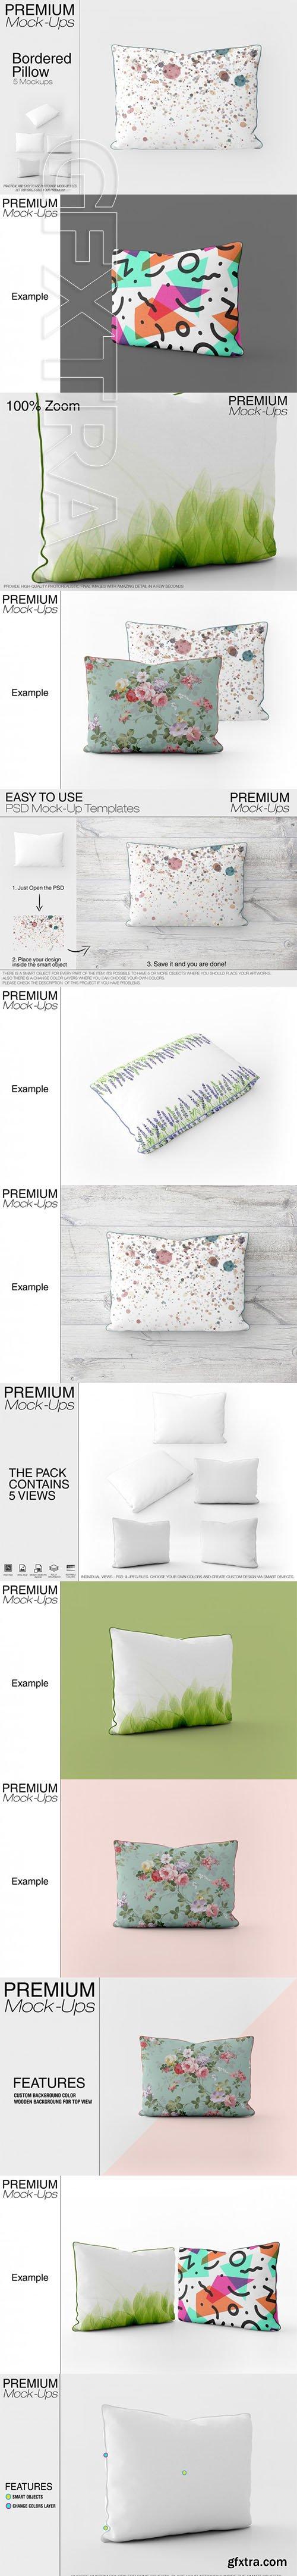 Bordered Pillow Mockup Pack 1